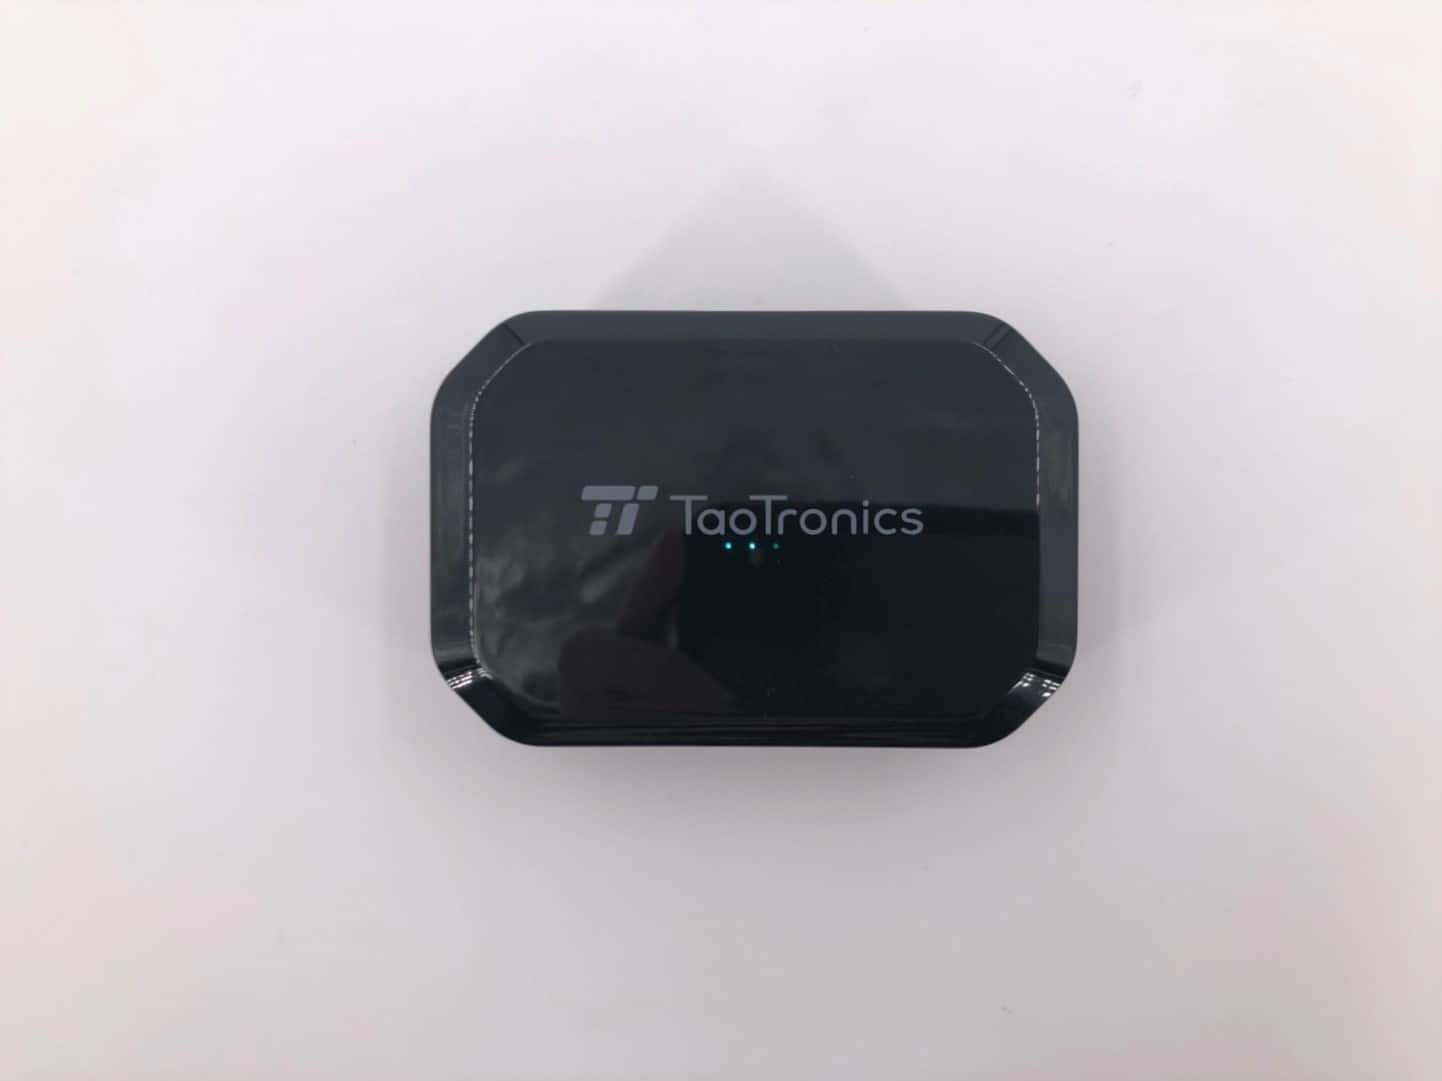 TaoTronicss TT-BH052真無線藍芽耳機推薦-CP值最高真無線藍牙耳機-充電艙